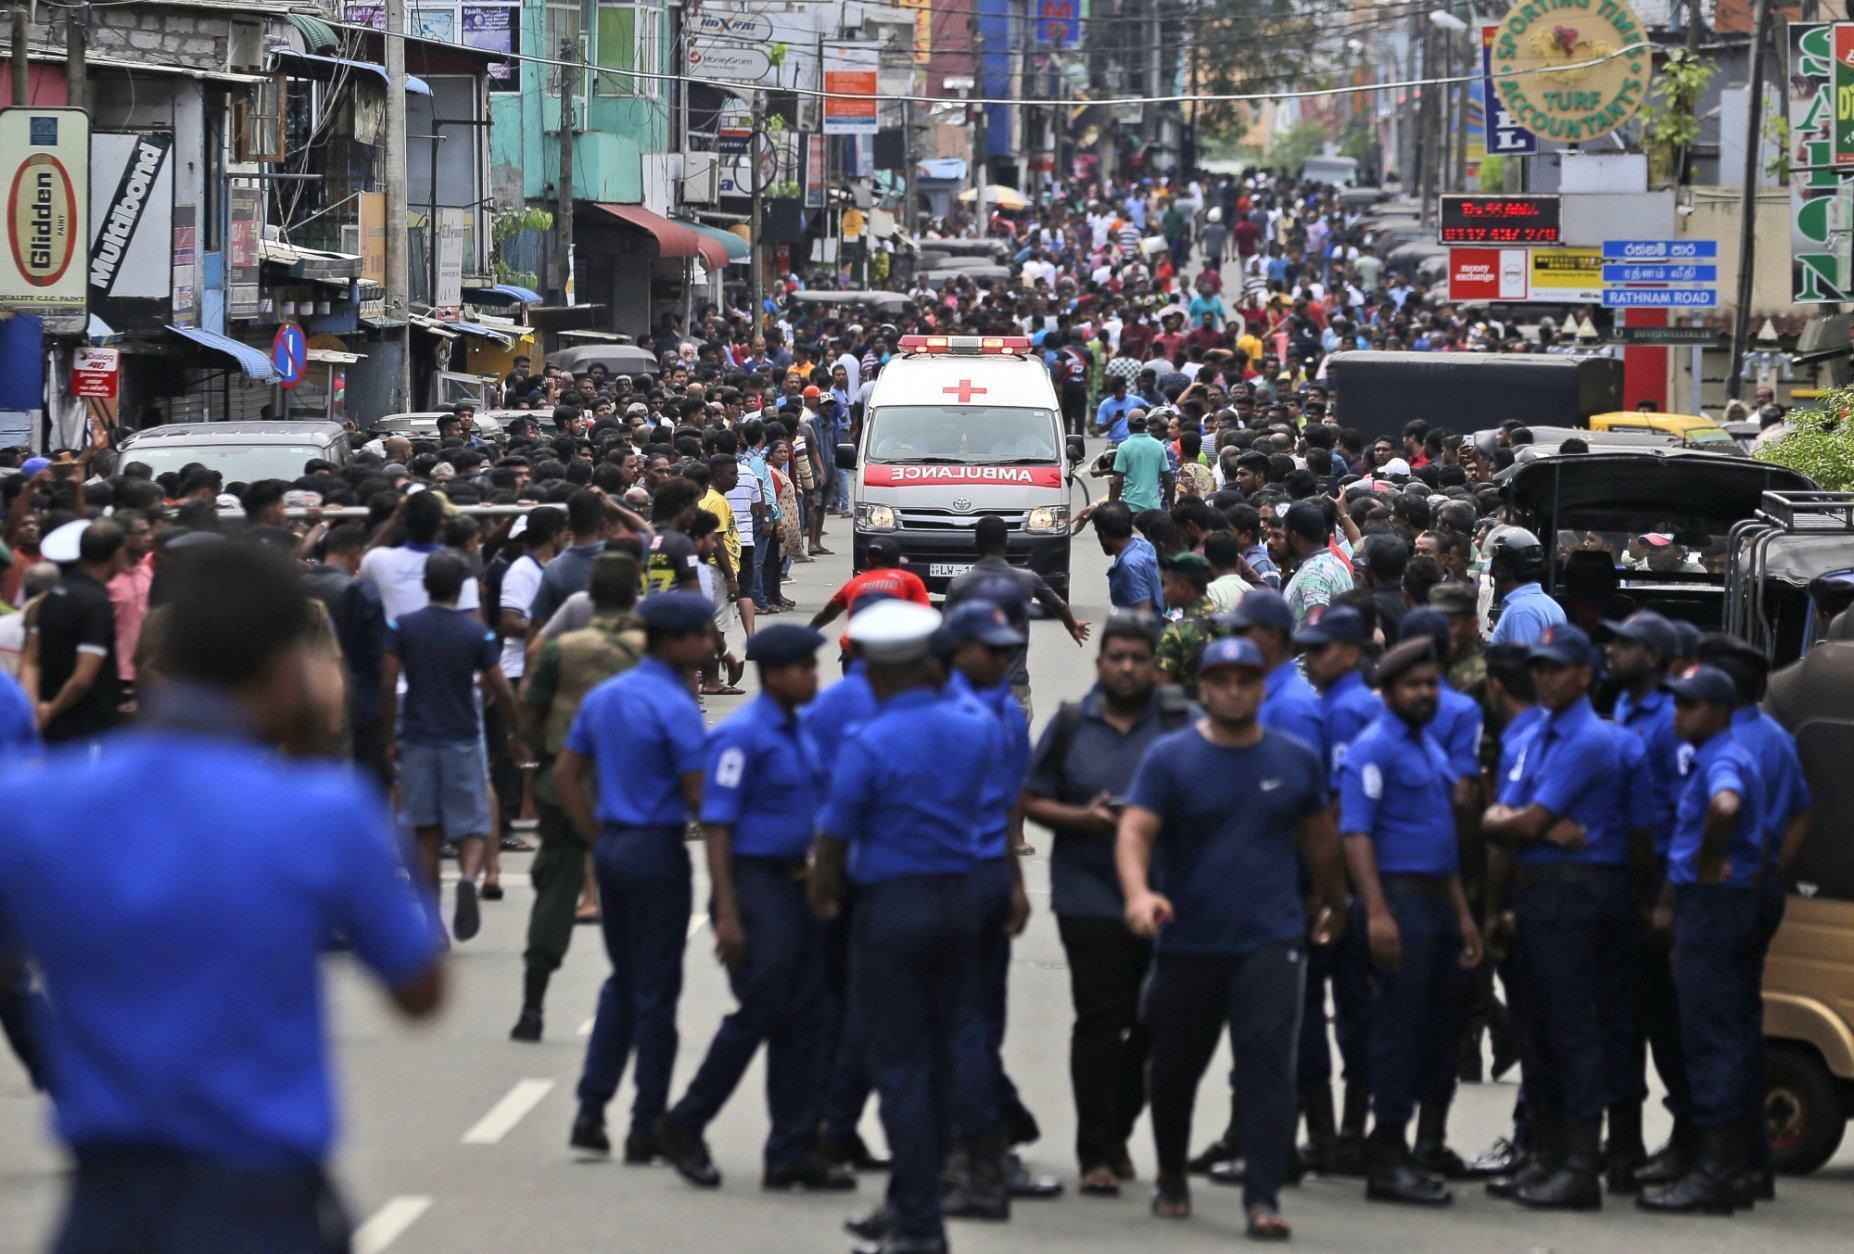 Sri Lankan police officers clear the road as an ambulance drives through carrying injured of Church blasts in Colombo, Sri Lanka, Sunday, April 21, 2019. A Sri Lanka hospital spokesman says several blasts on Easter Sunday have killed dozens of people. (AP Photo/Eranga Jayawardena)